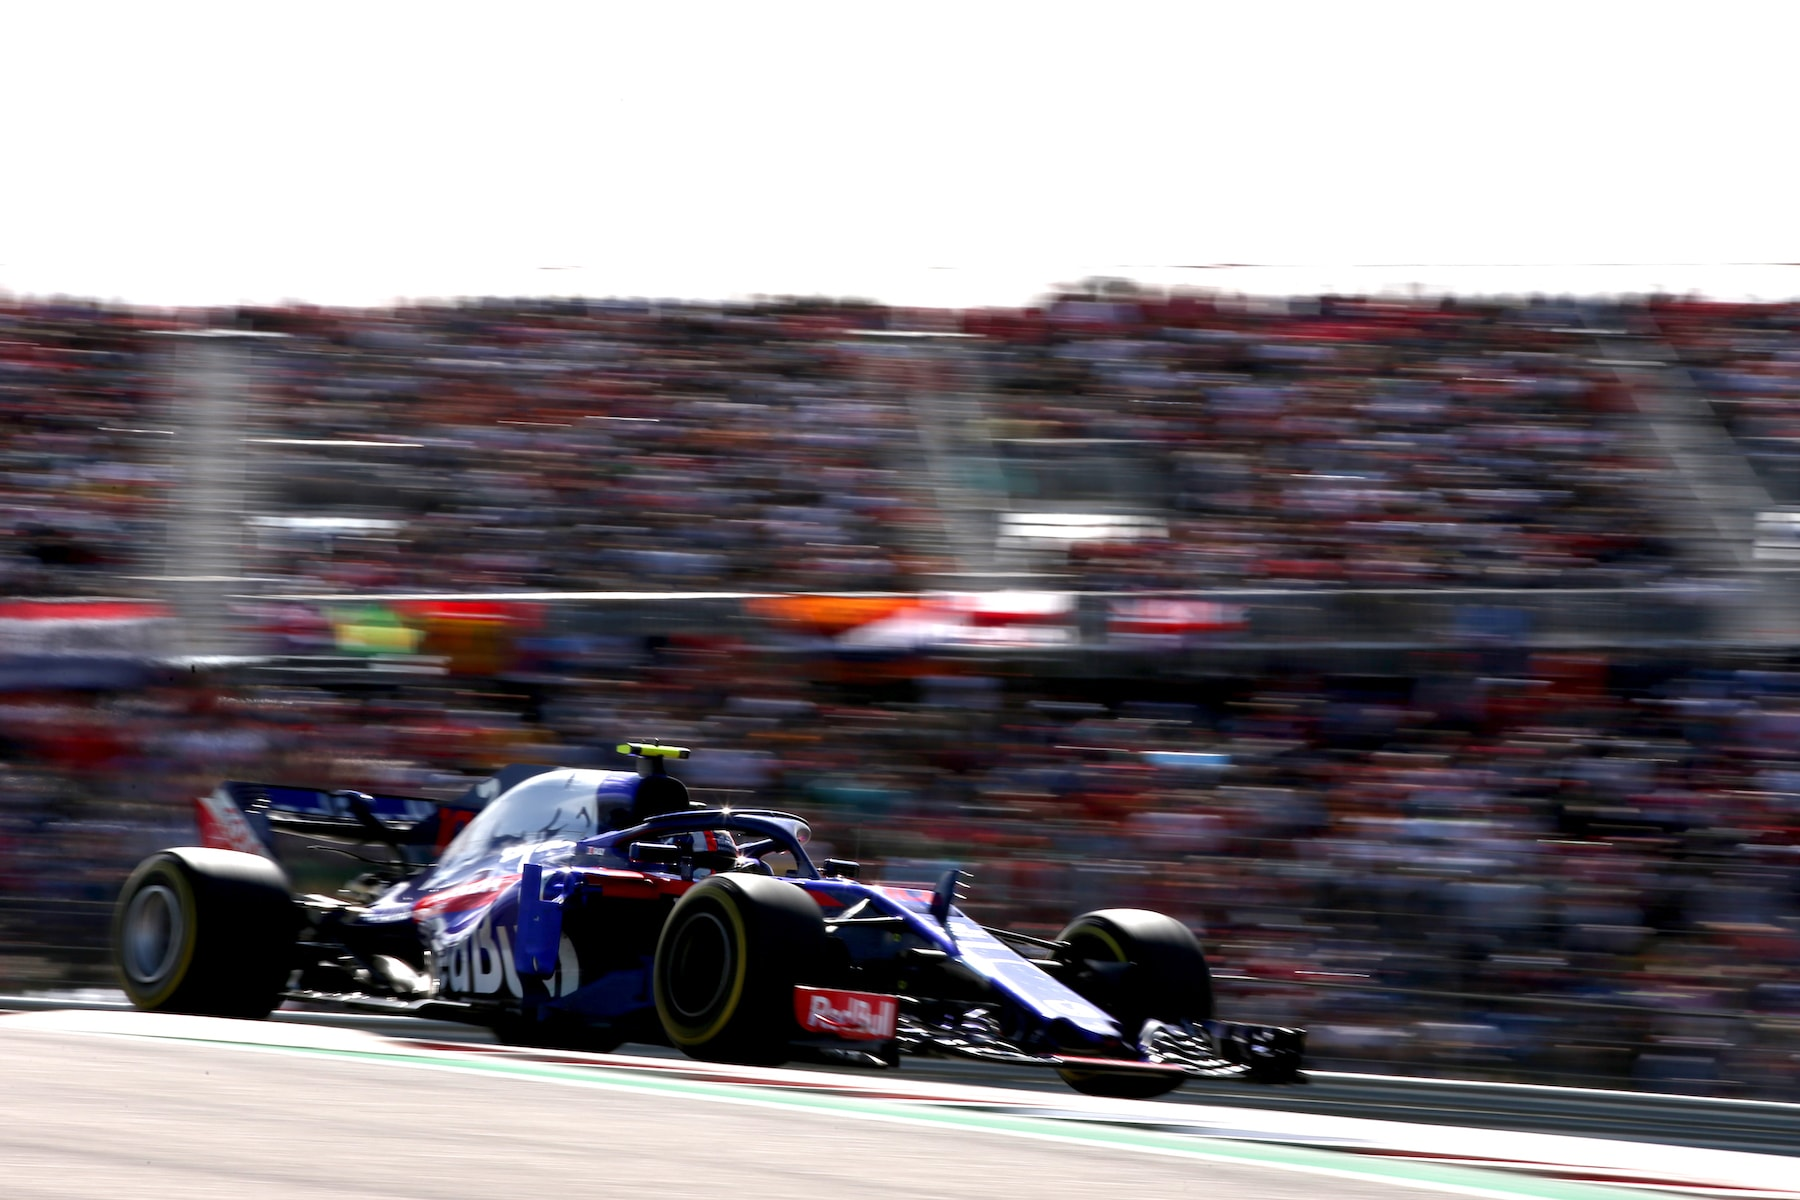 G 2018 Pierre Gasly | Toro Rosso STR13 | 2018 USGP 1 copy.jpg